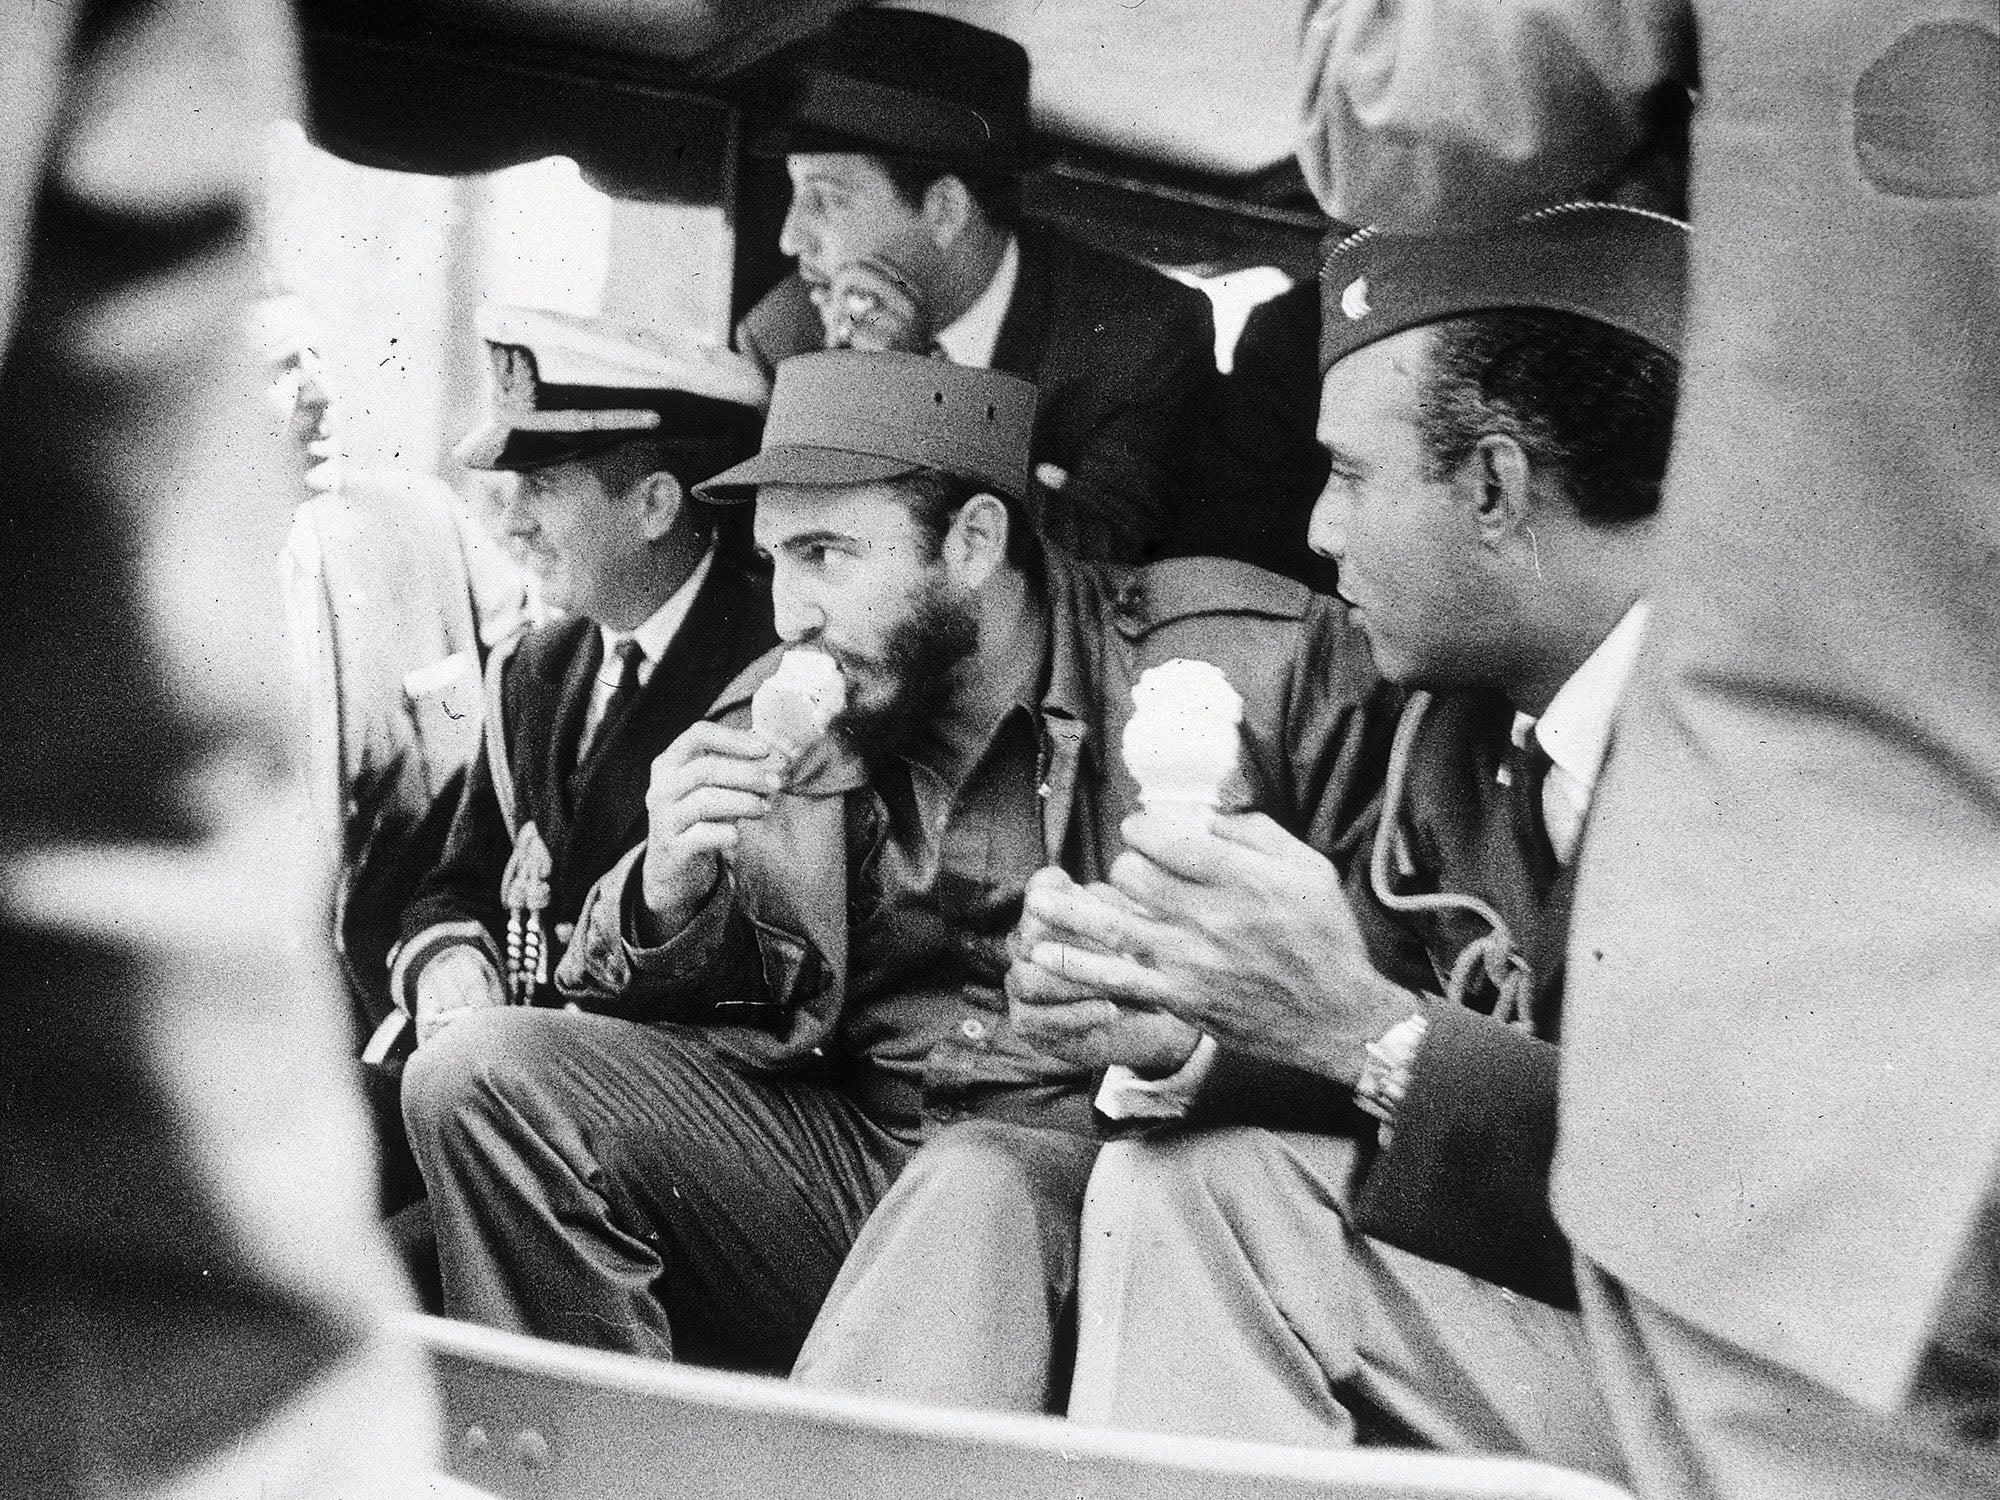 Inside Cuba's Intense Ice Cream Obsession